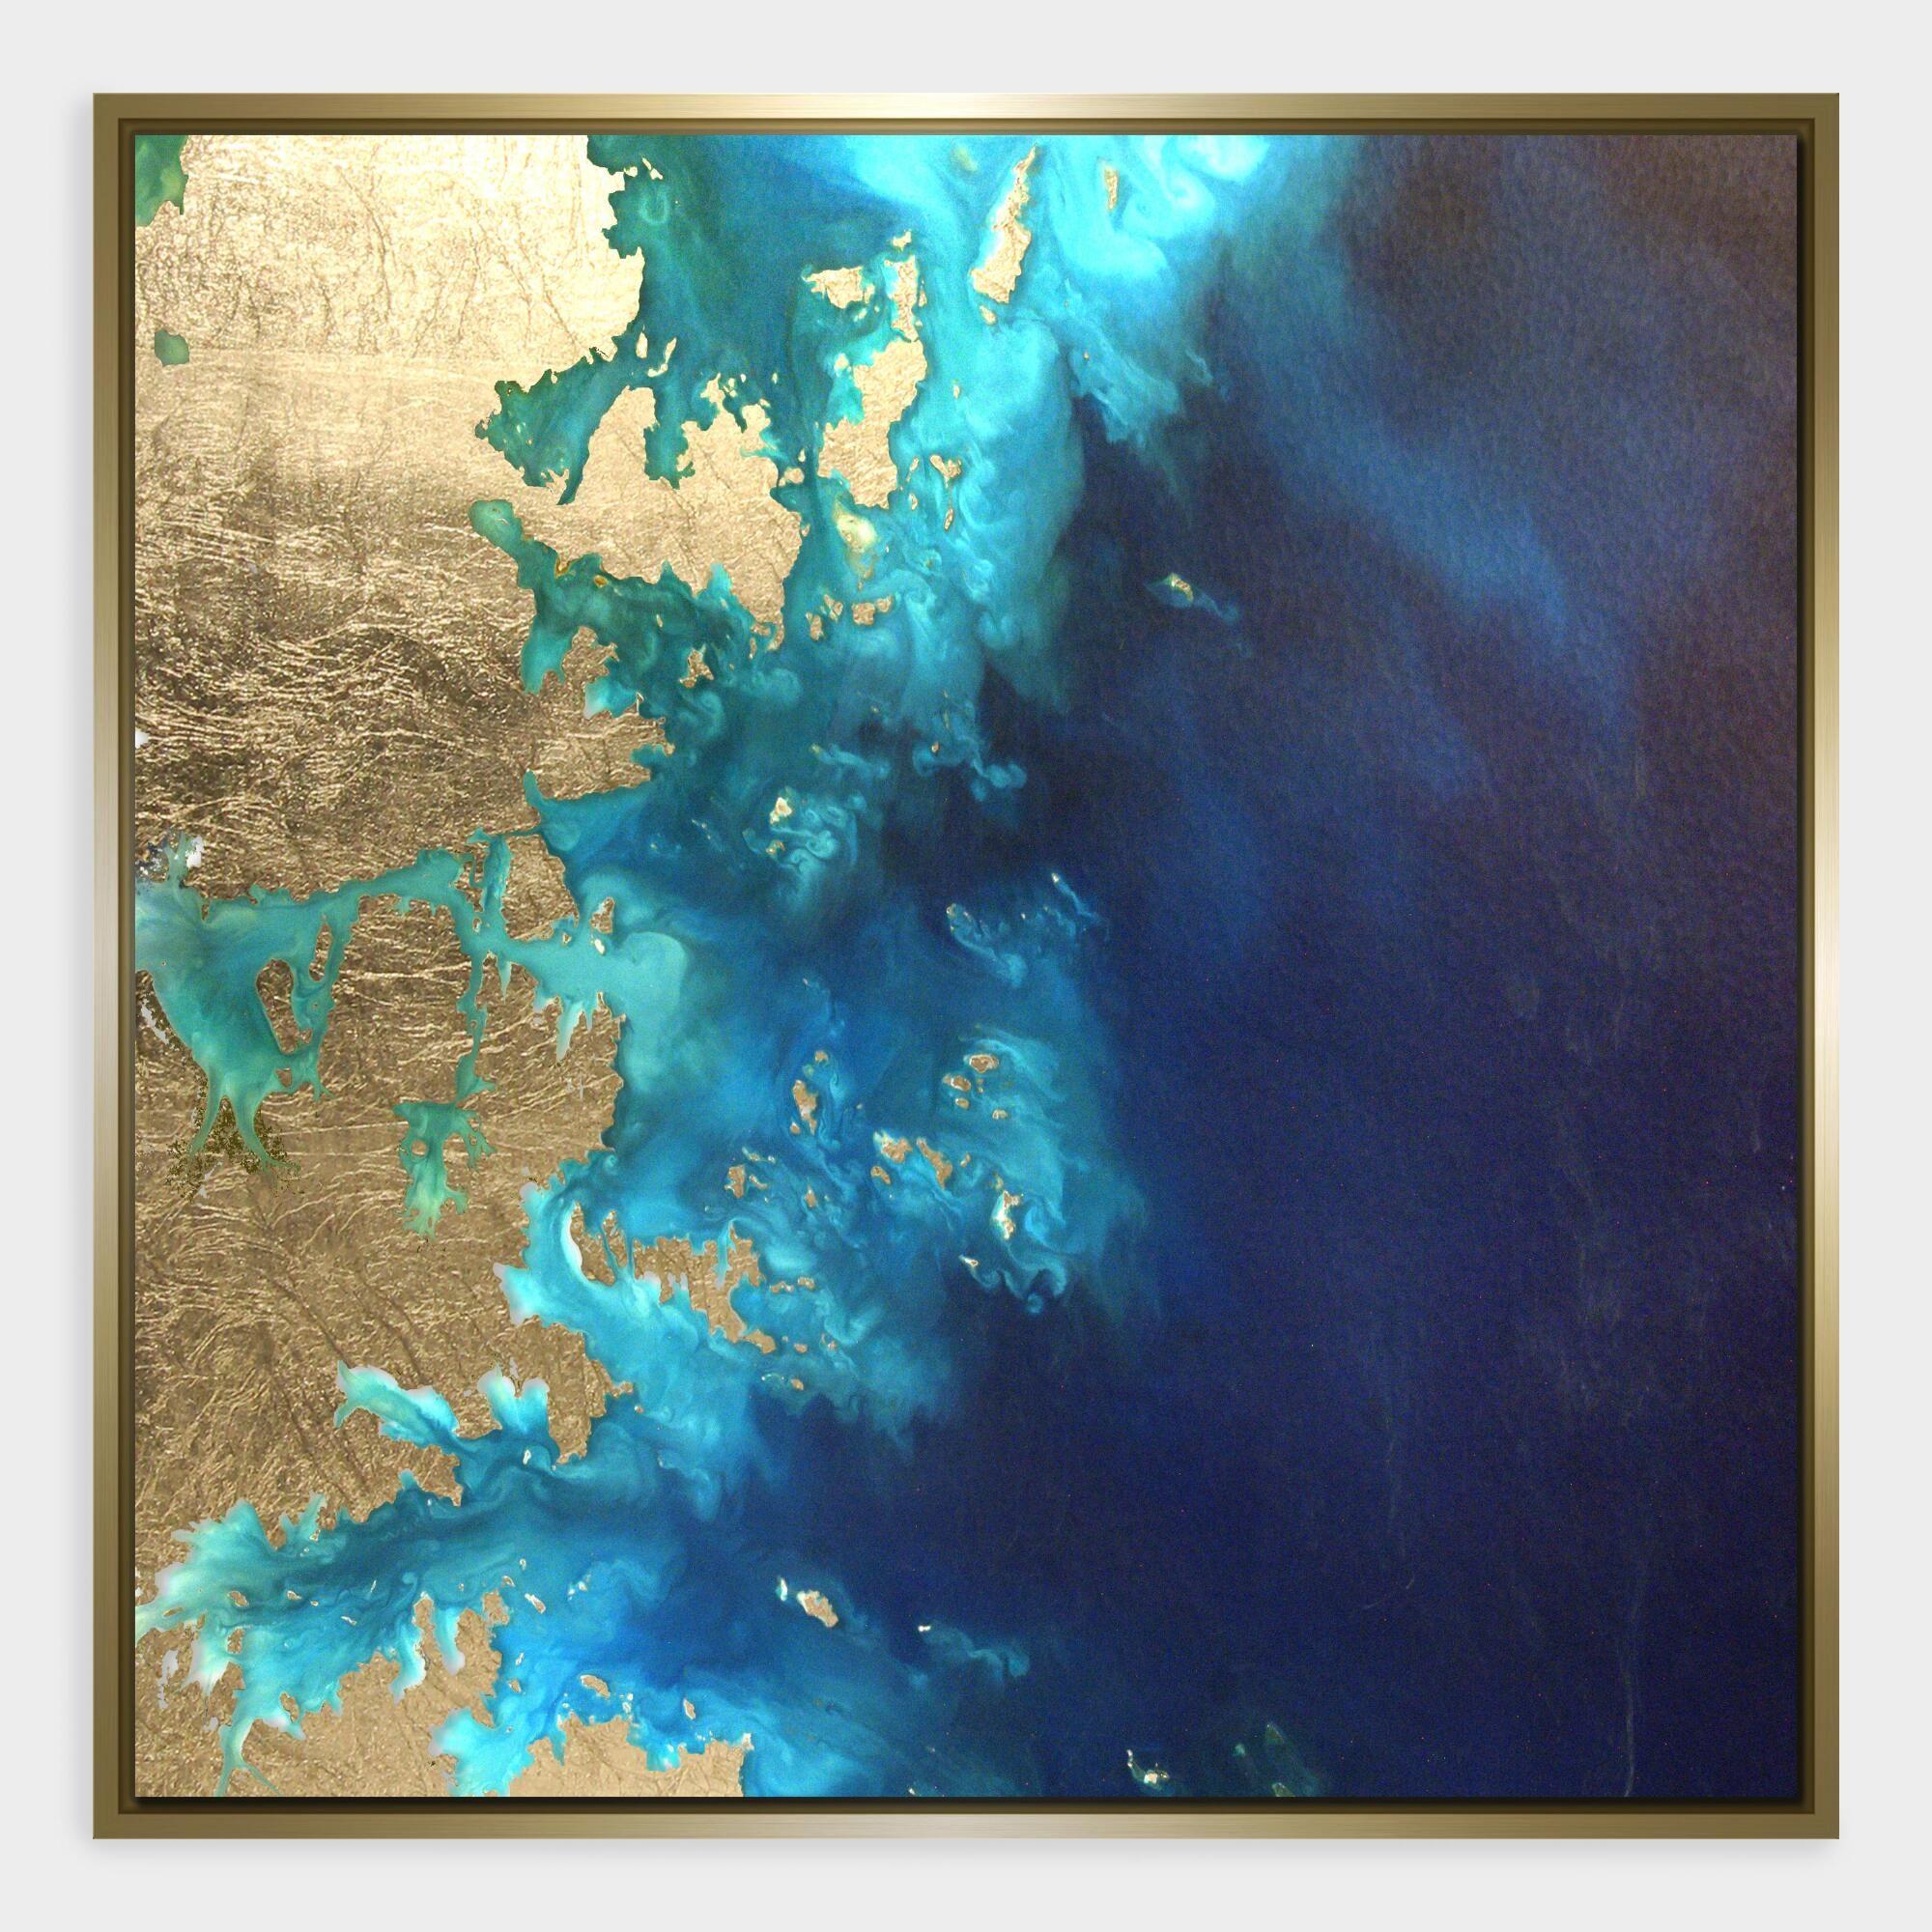 4f03d1967db2 Gold Leaf Land And Sea Print Framed Wall Art  Blue - Medium by World Market